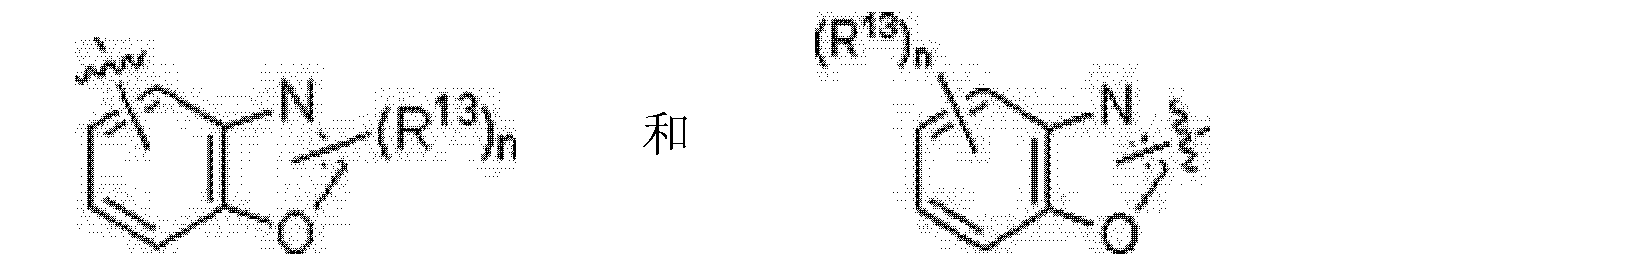 Figure CN102378762AD00314